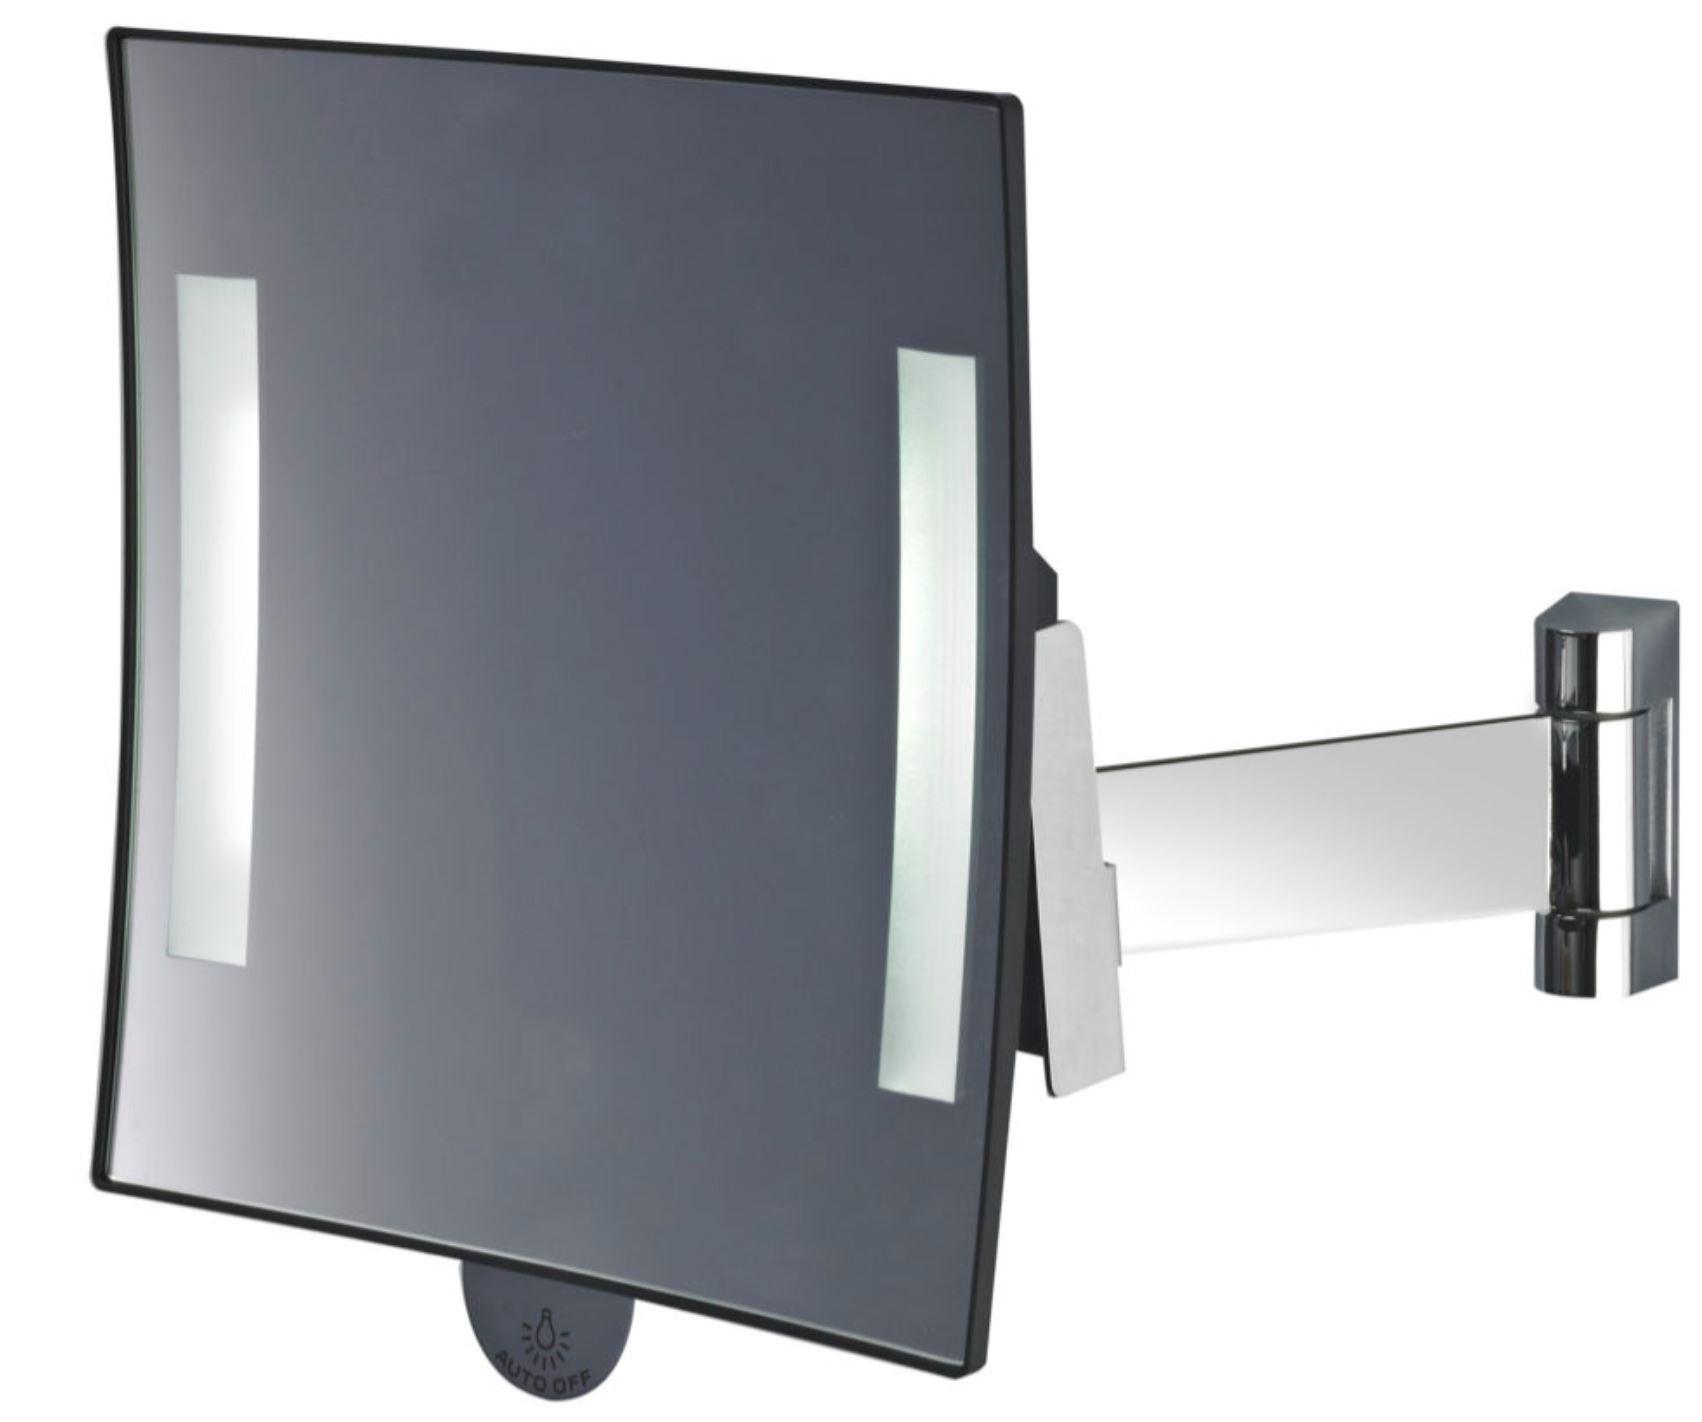 Miroir grossissant lumineux carré JVD Galaxy chrome